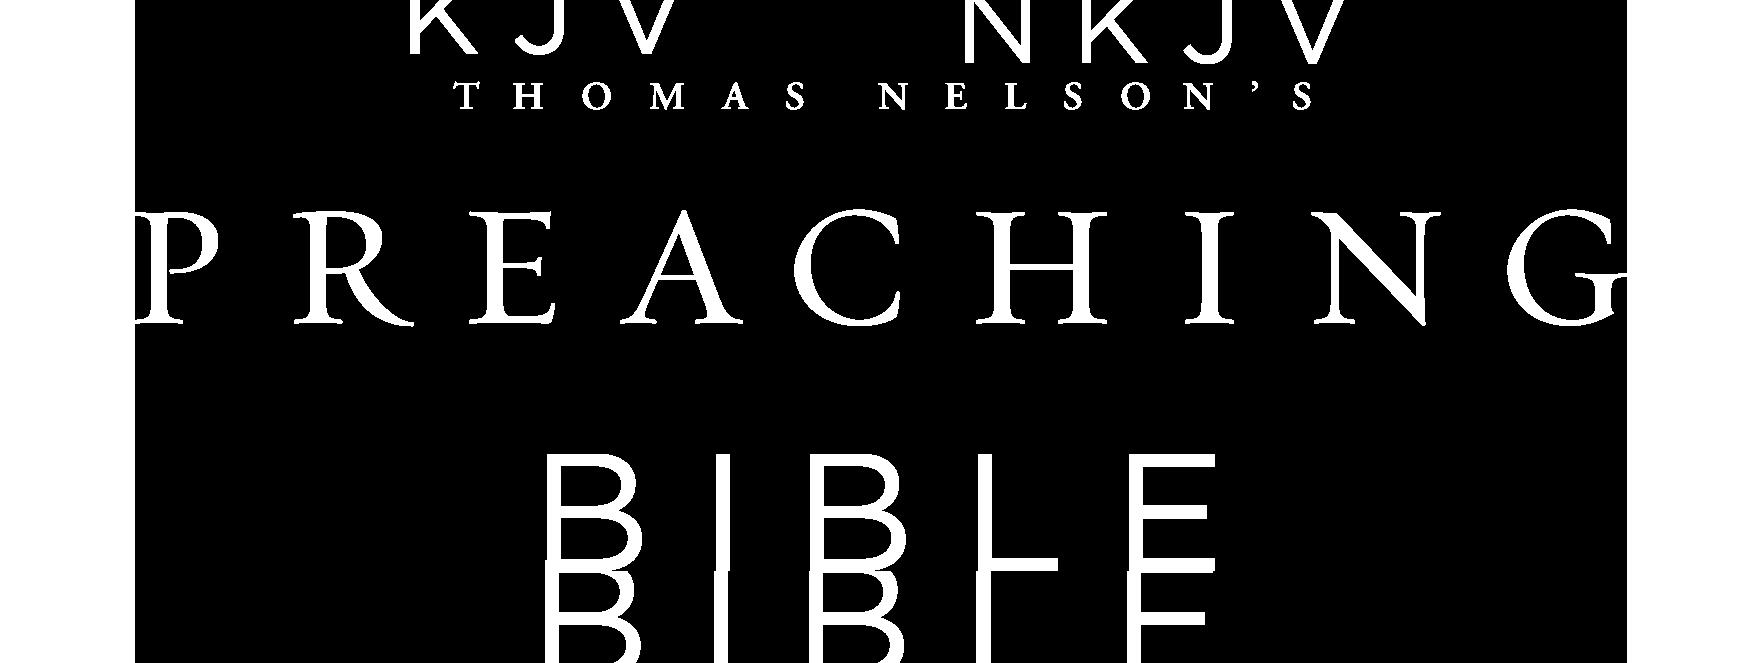 Thomas Nelson's Preaching Bible